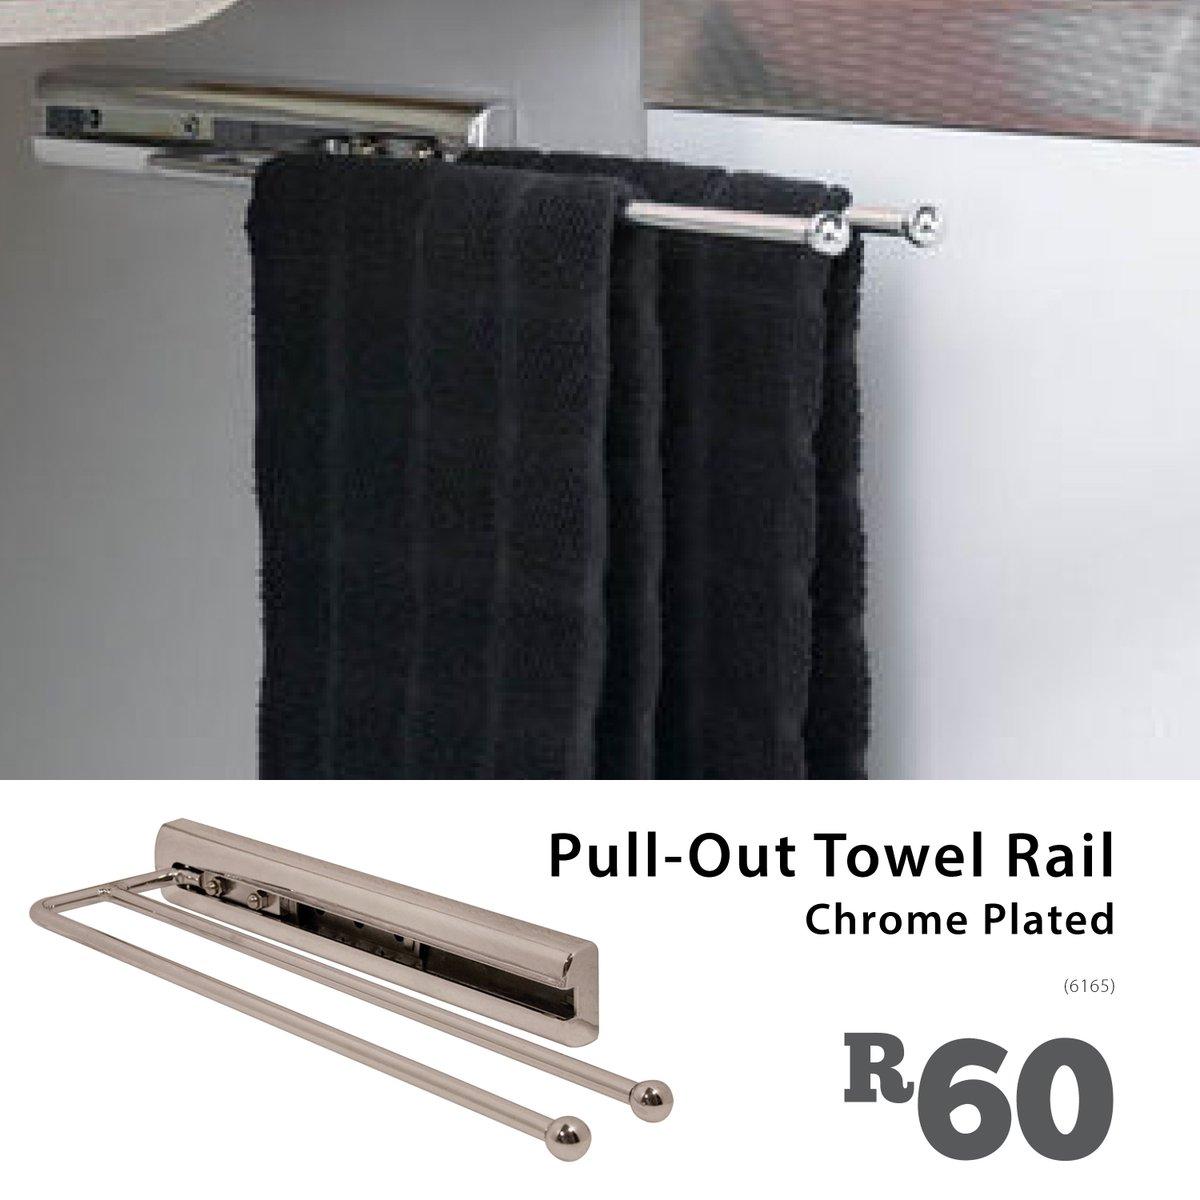 Gelmar On Twitter Gell All Your Towel